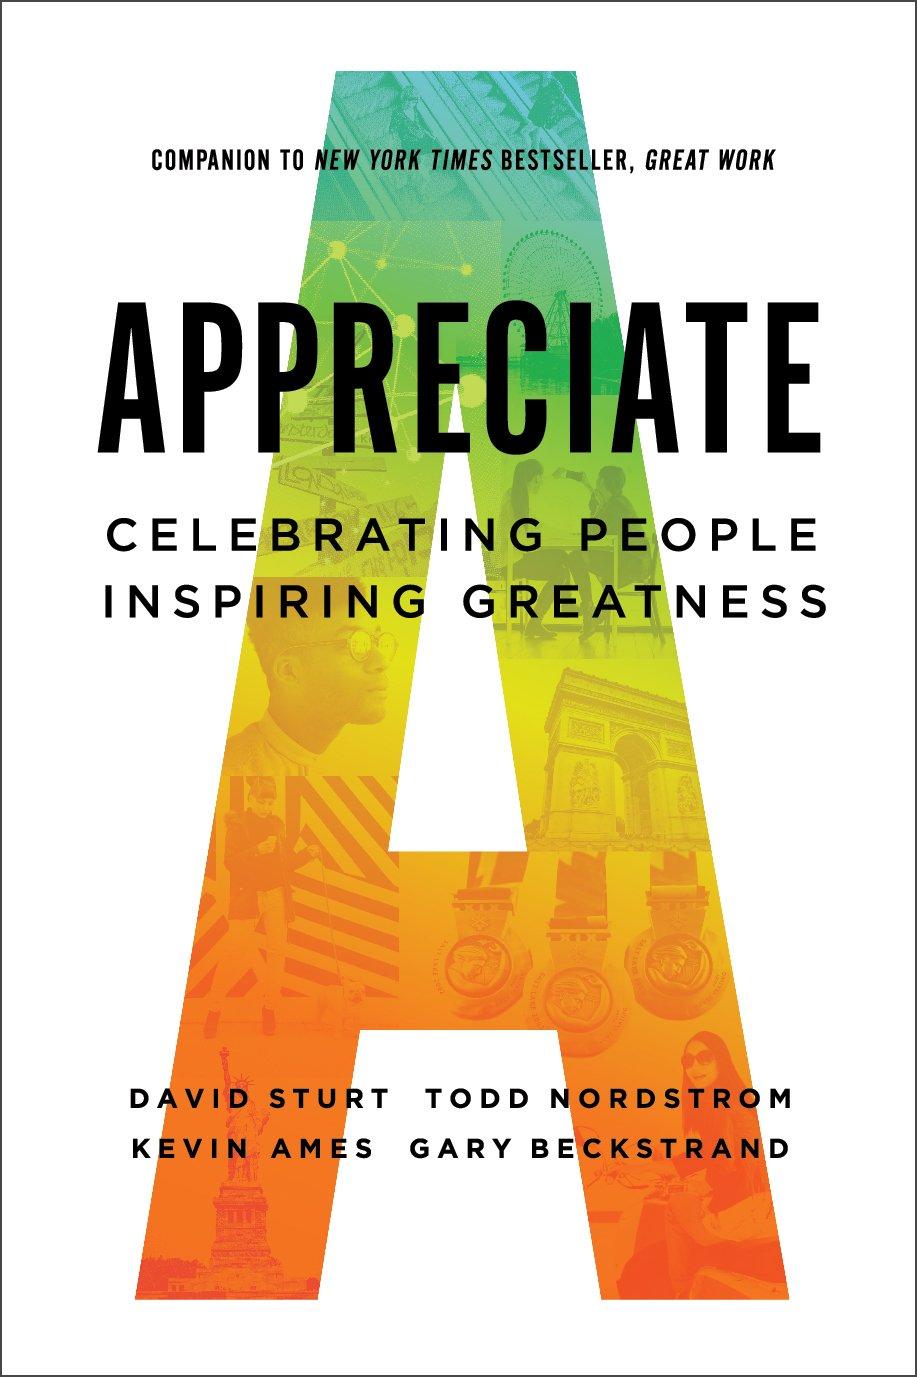 appreciate celebrating people inspiring greatness david sturt